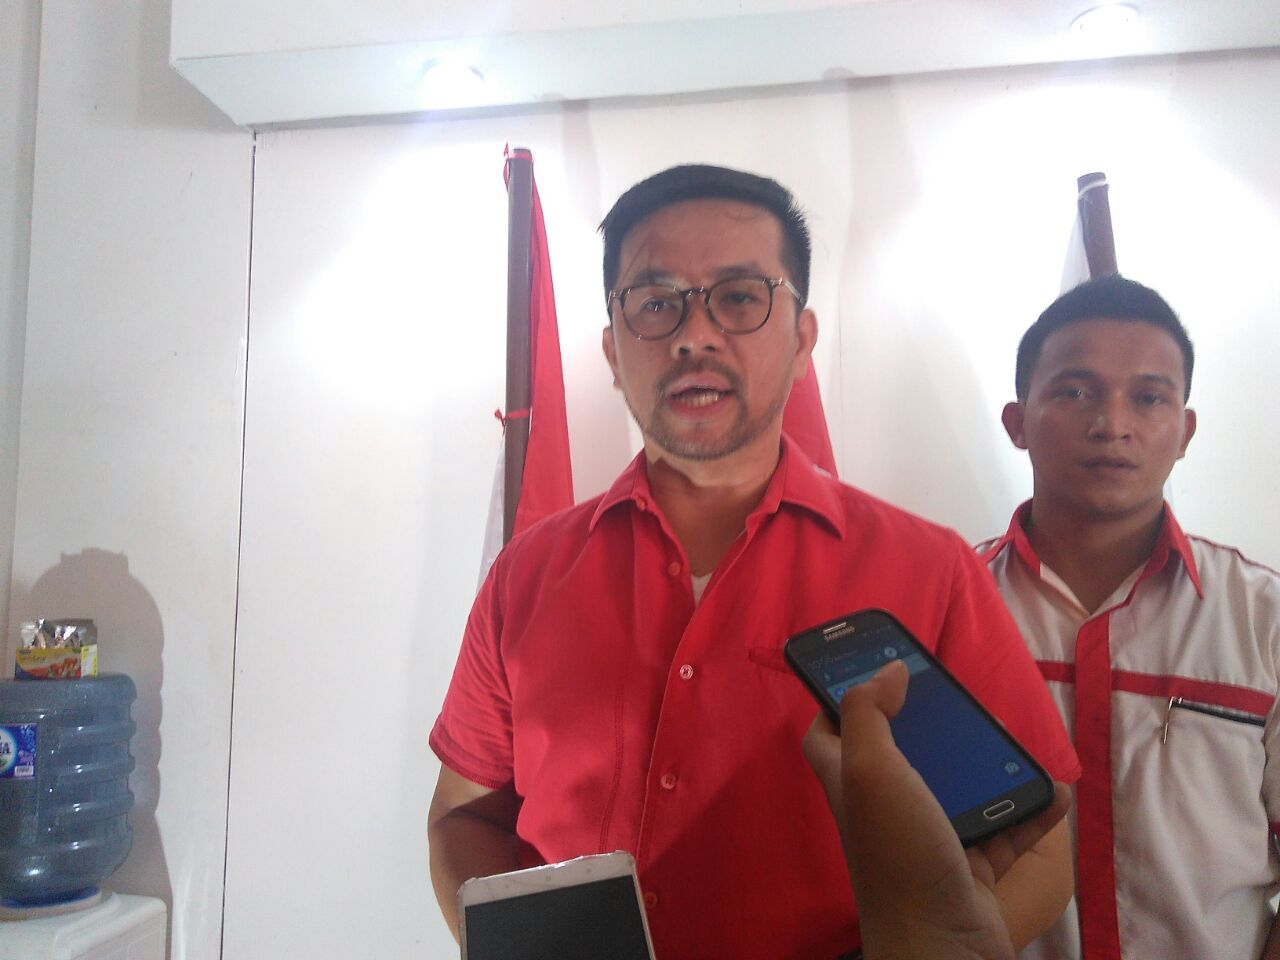 POLITISI PDIP DARI TANGERANG MARINUS GEA SEBUT ISU TENAGA KERJA ASING SENGAJA DIGORENG